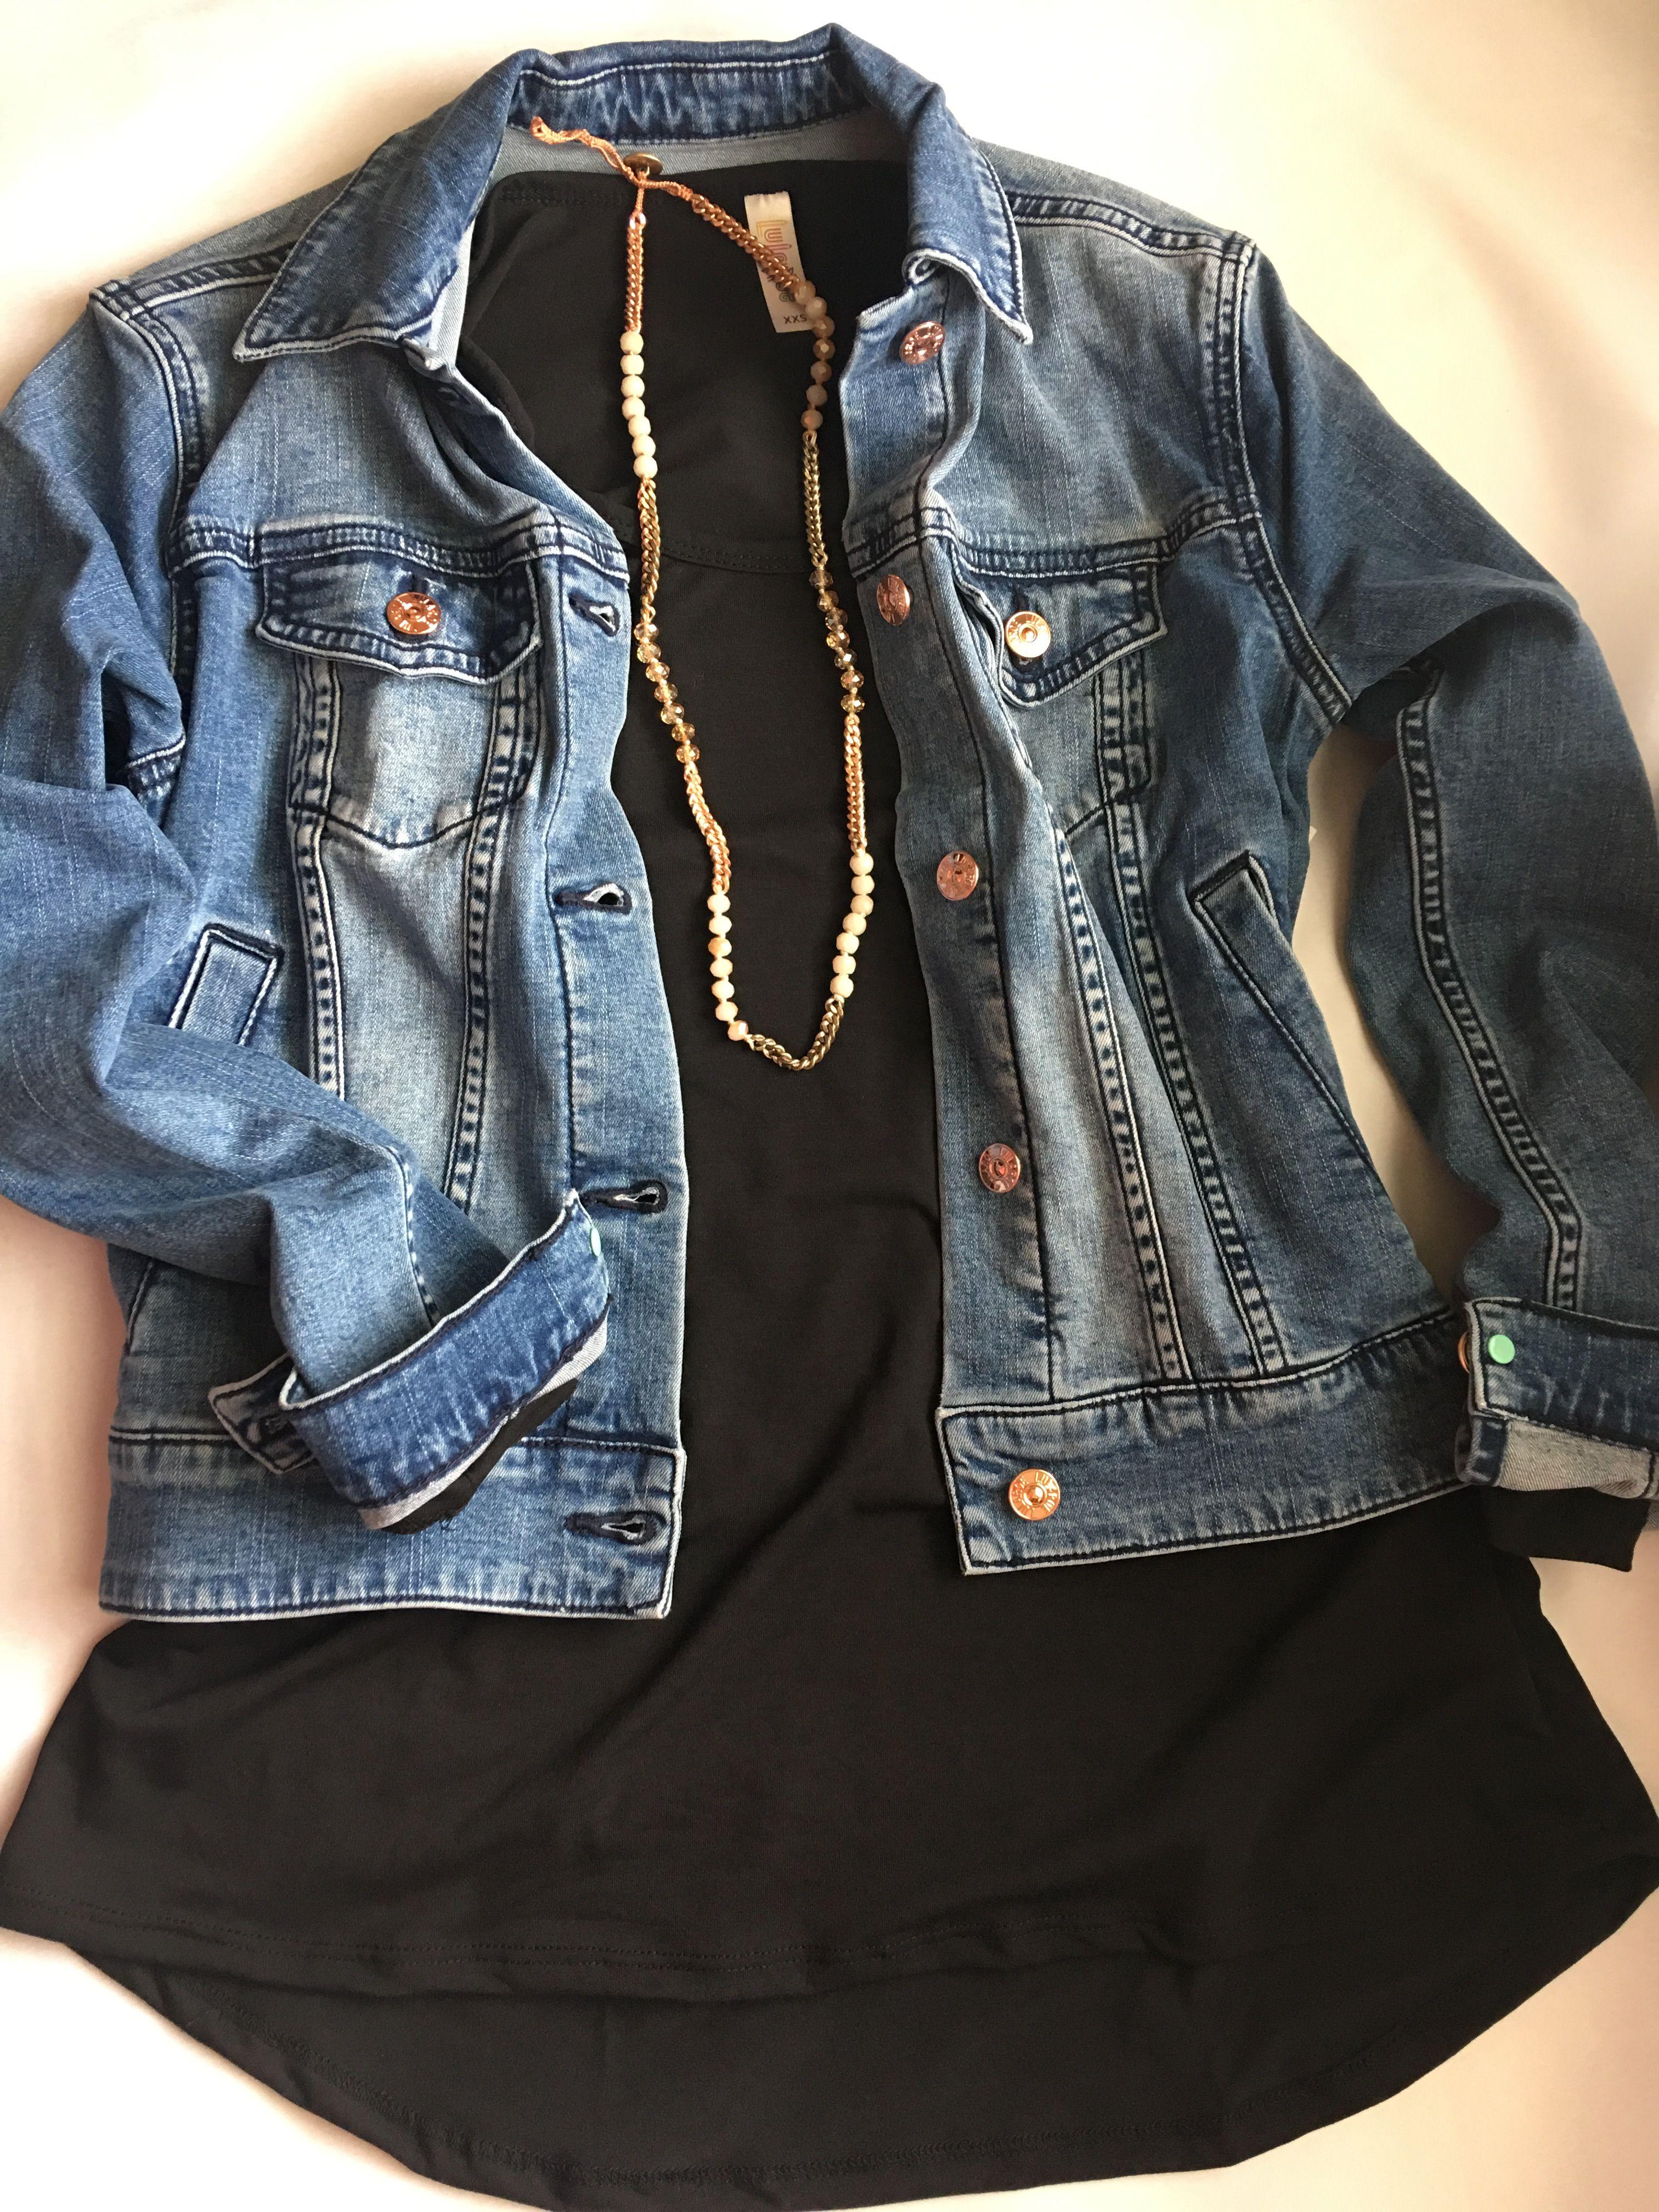 Rose Gold Buttons On This Harvey Jacket Are Sooo Good Denim Jacket Jackets Denim [ 4032 x 3024 Pixel ]